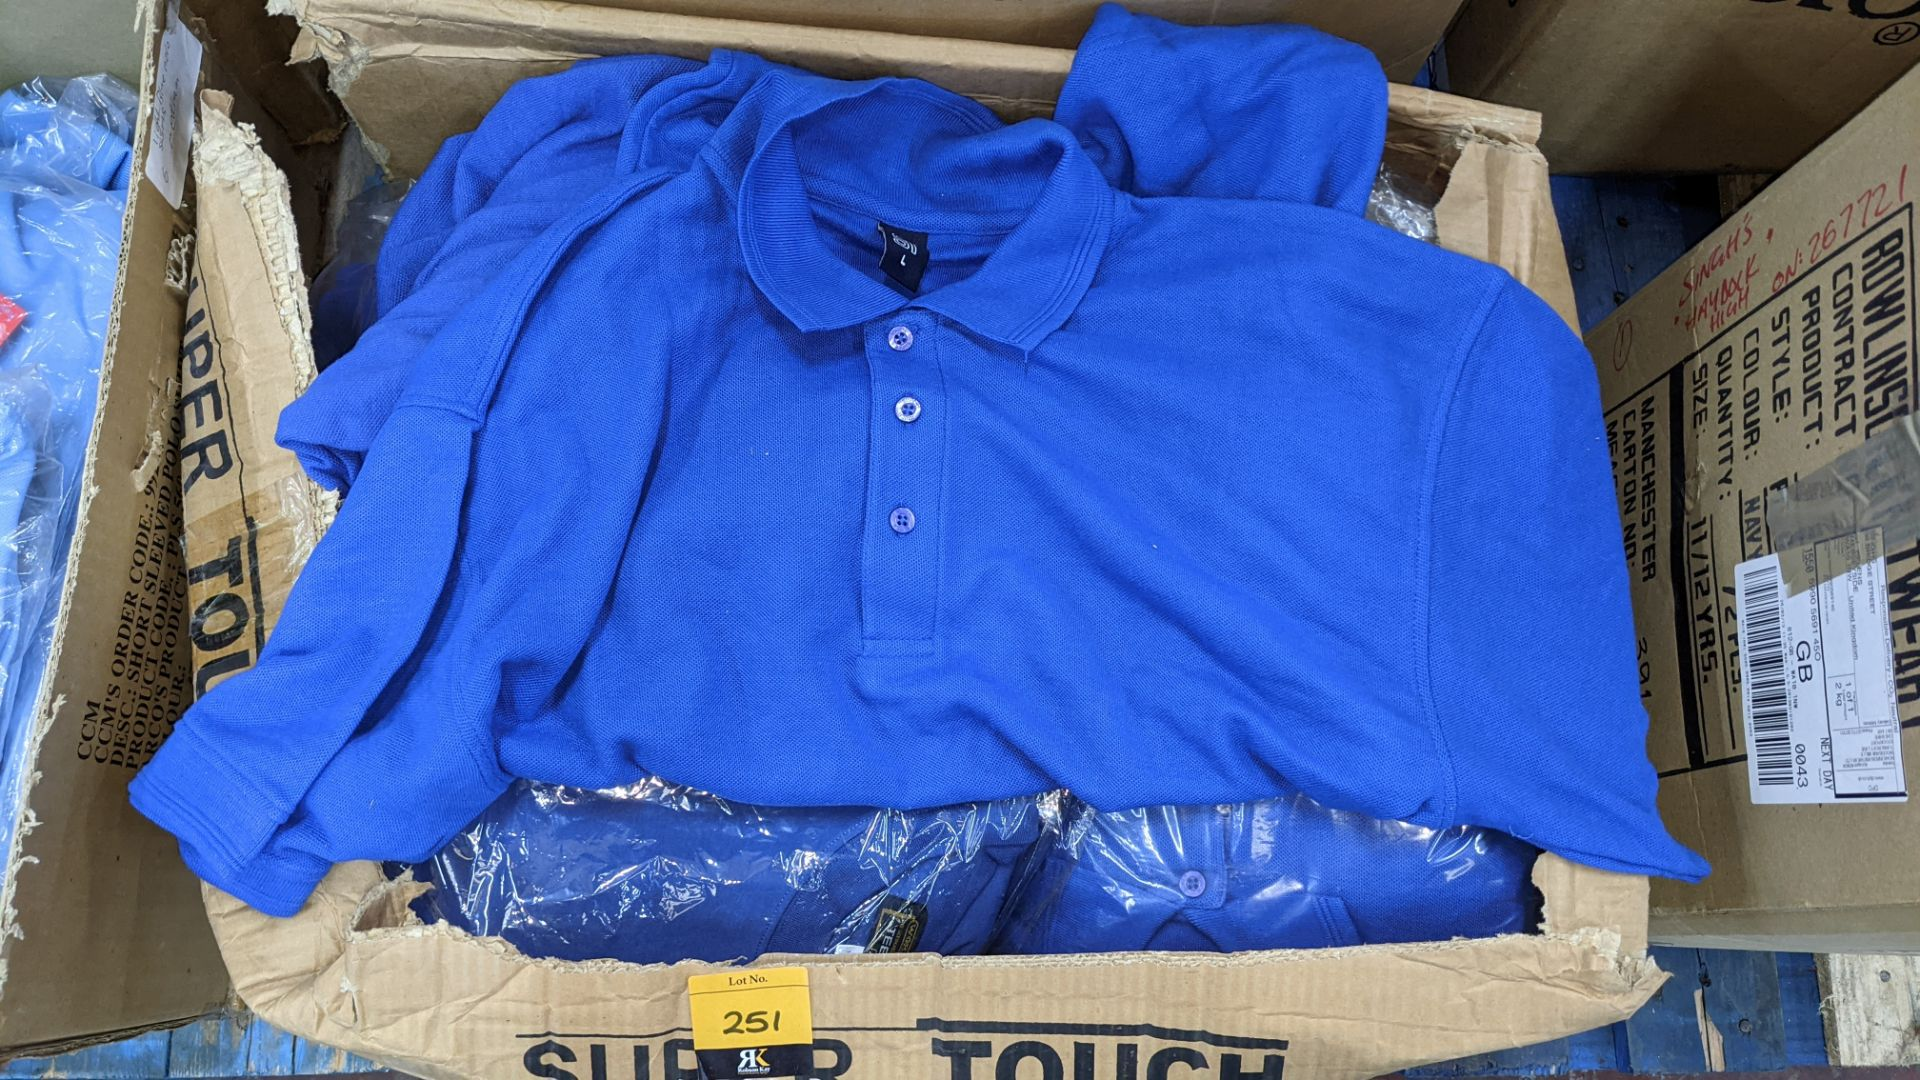 Quantity of royal blue polo shirts - 1 box - Image 4 of 4